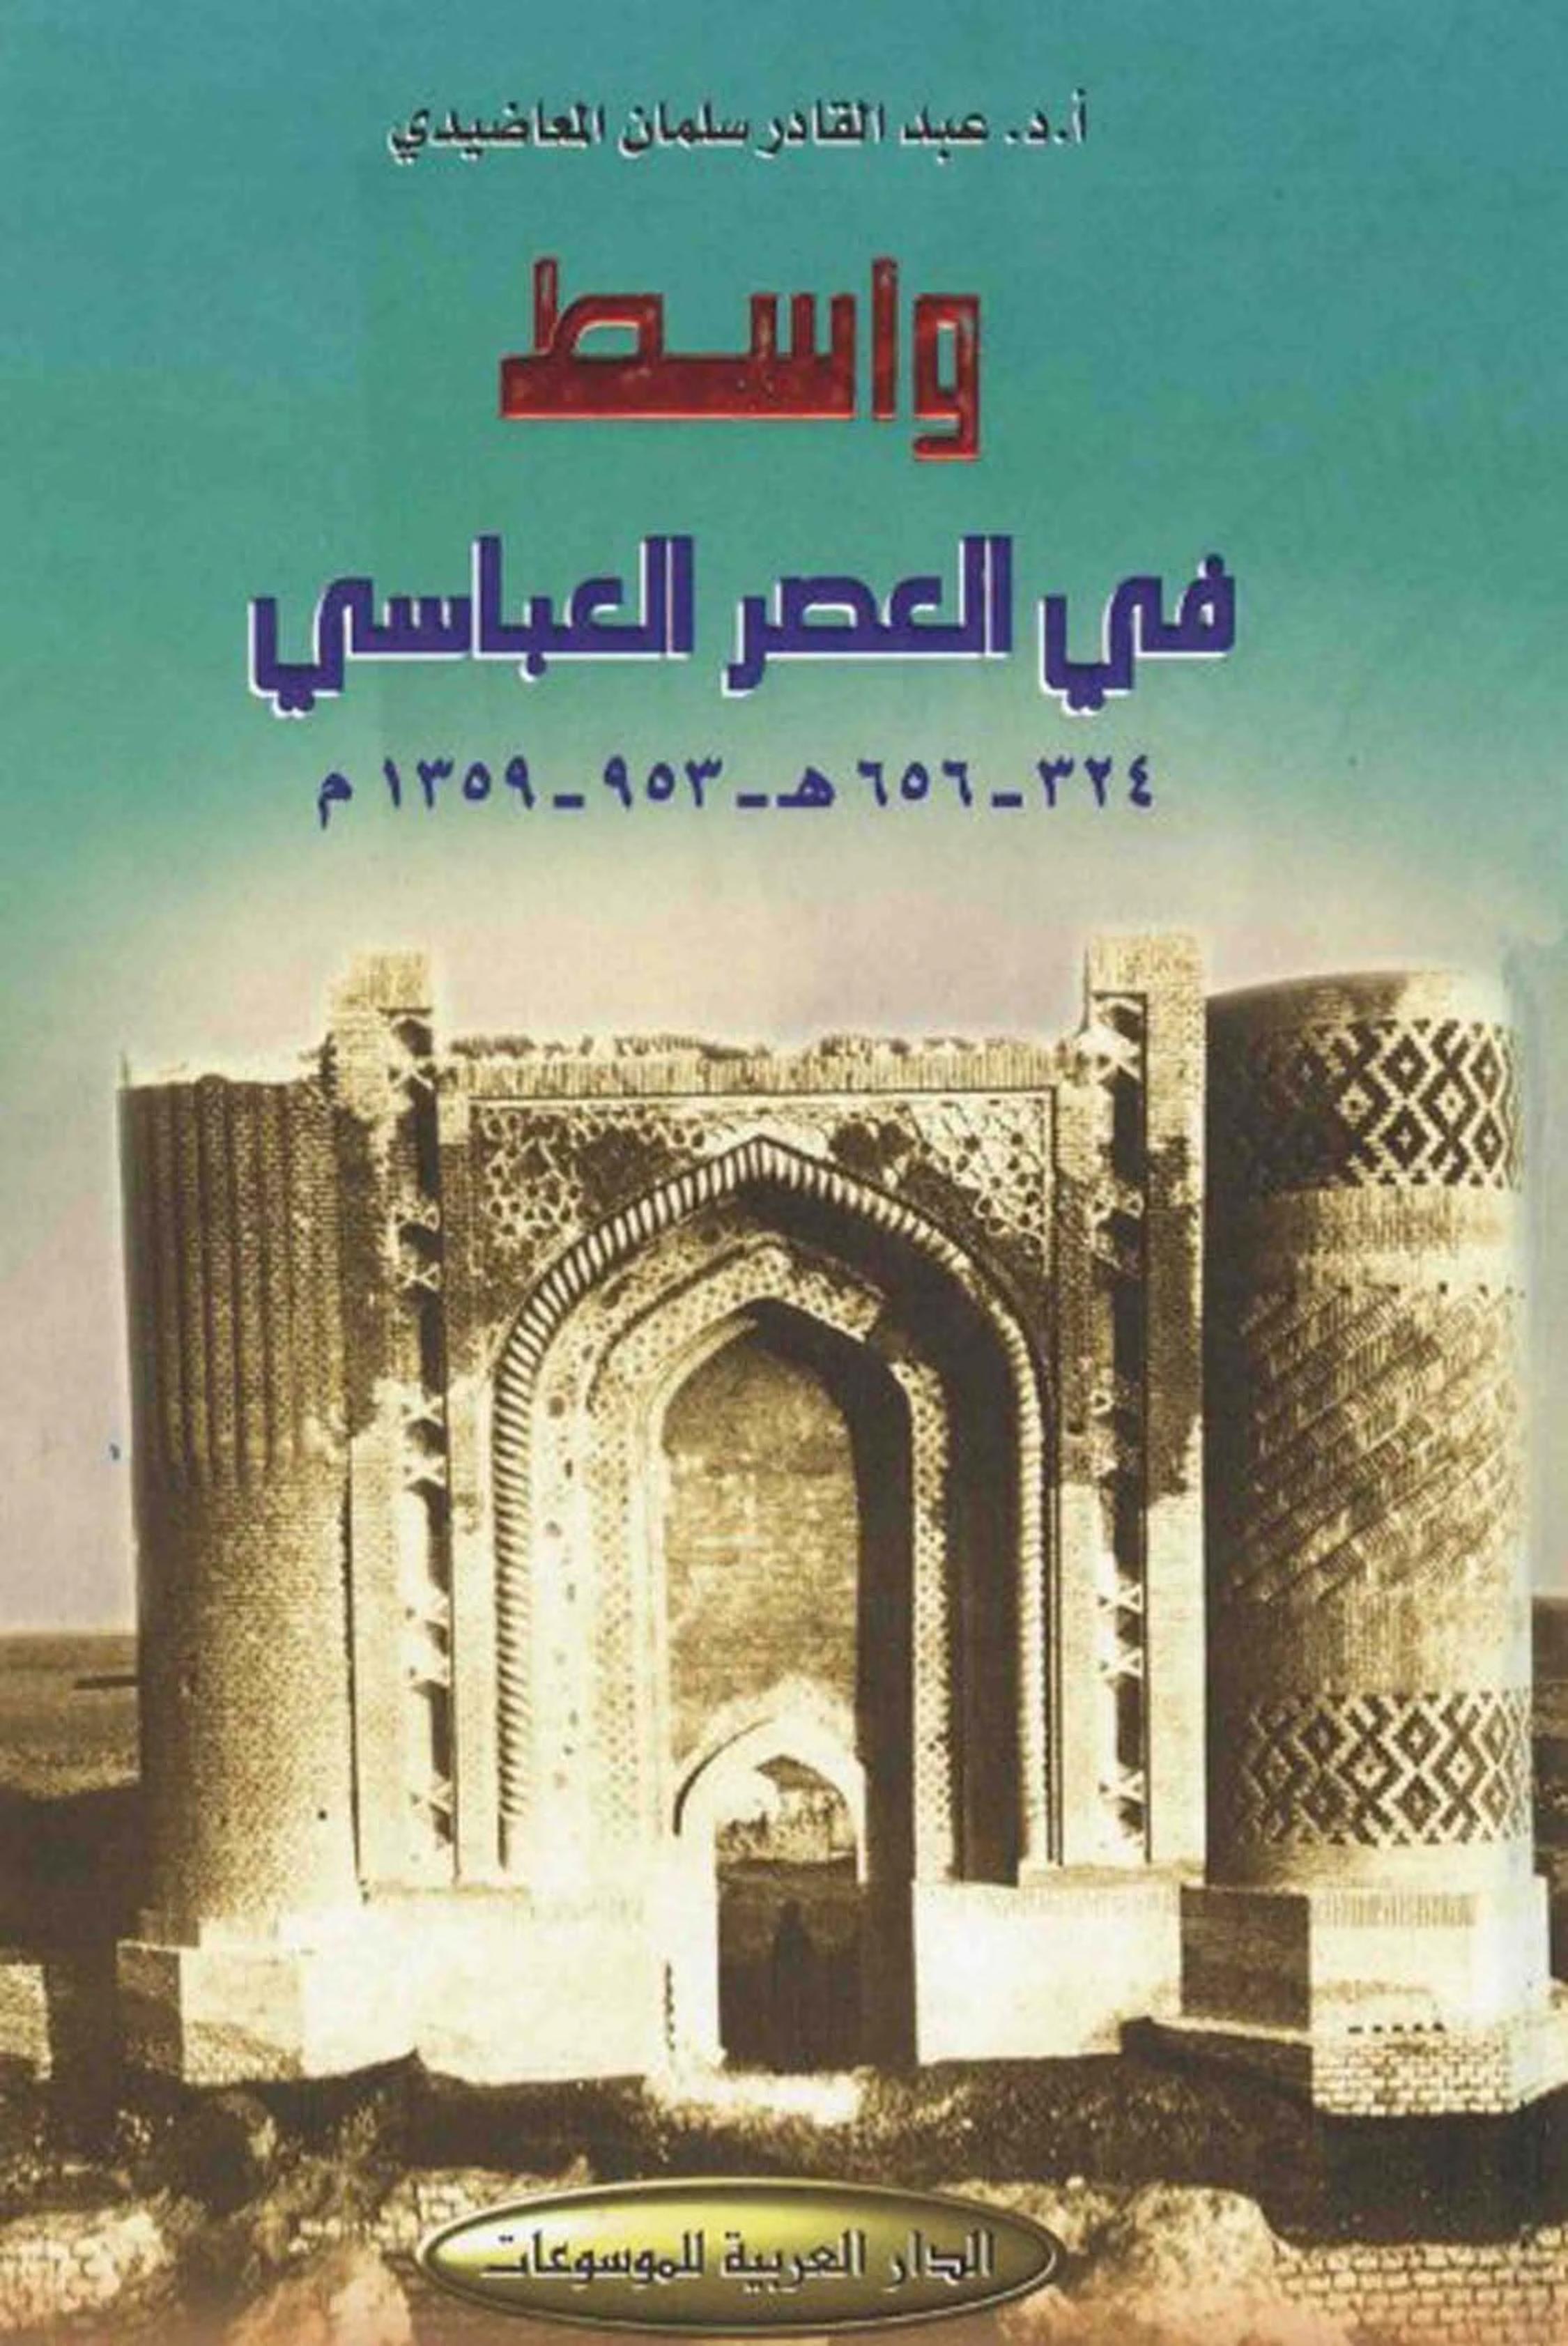 واسط في العصر العباسي Free Download Borrow And Streaming Internet Archive Internet Archive Arabic Books The Borrowers